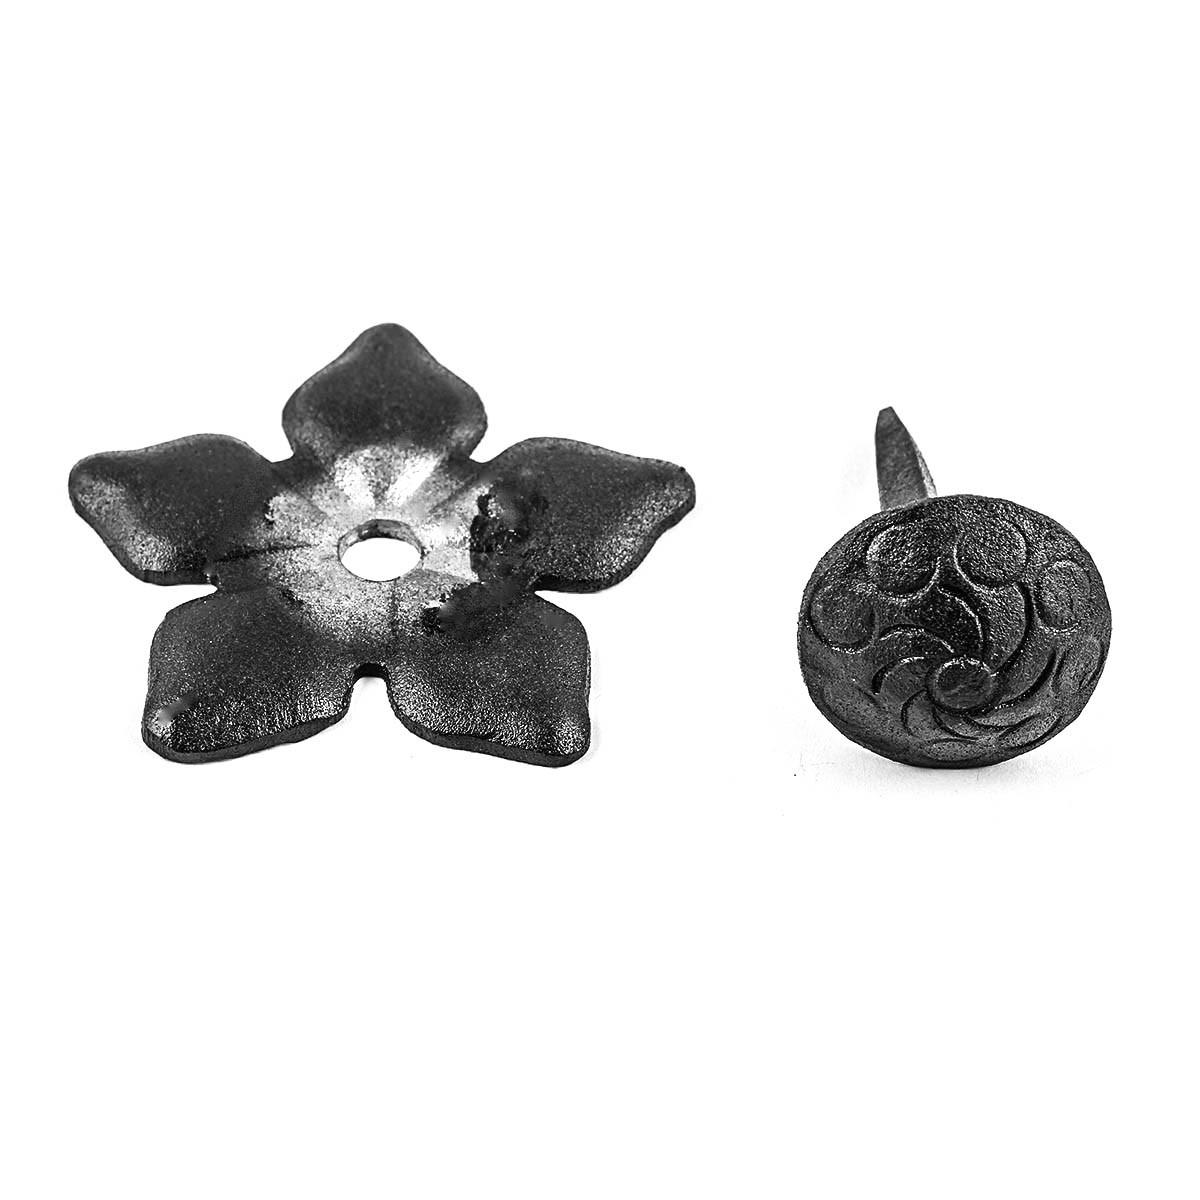 Clavos Decorative Nail Big Head Black Iron 3 H Wrought Iron Nails For Wood Black Iron Nails Clavos Decorative Nails